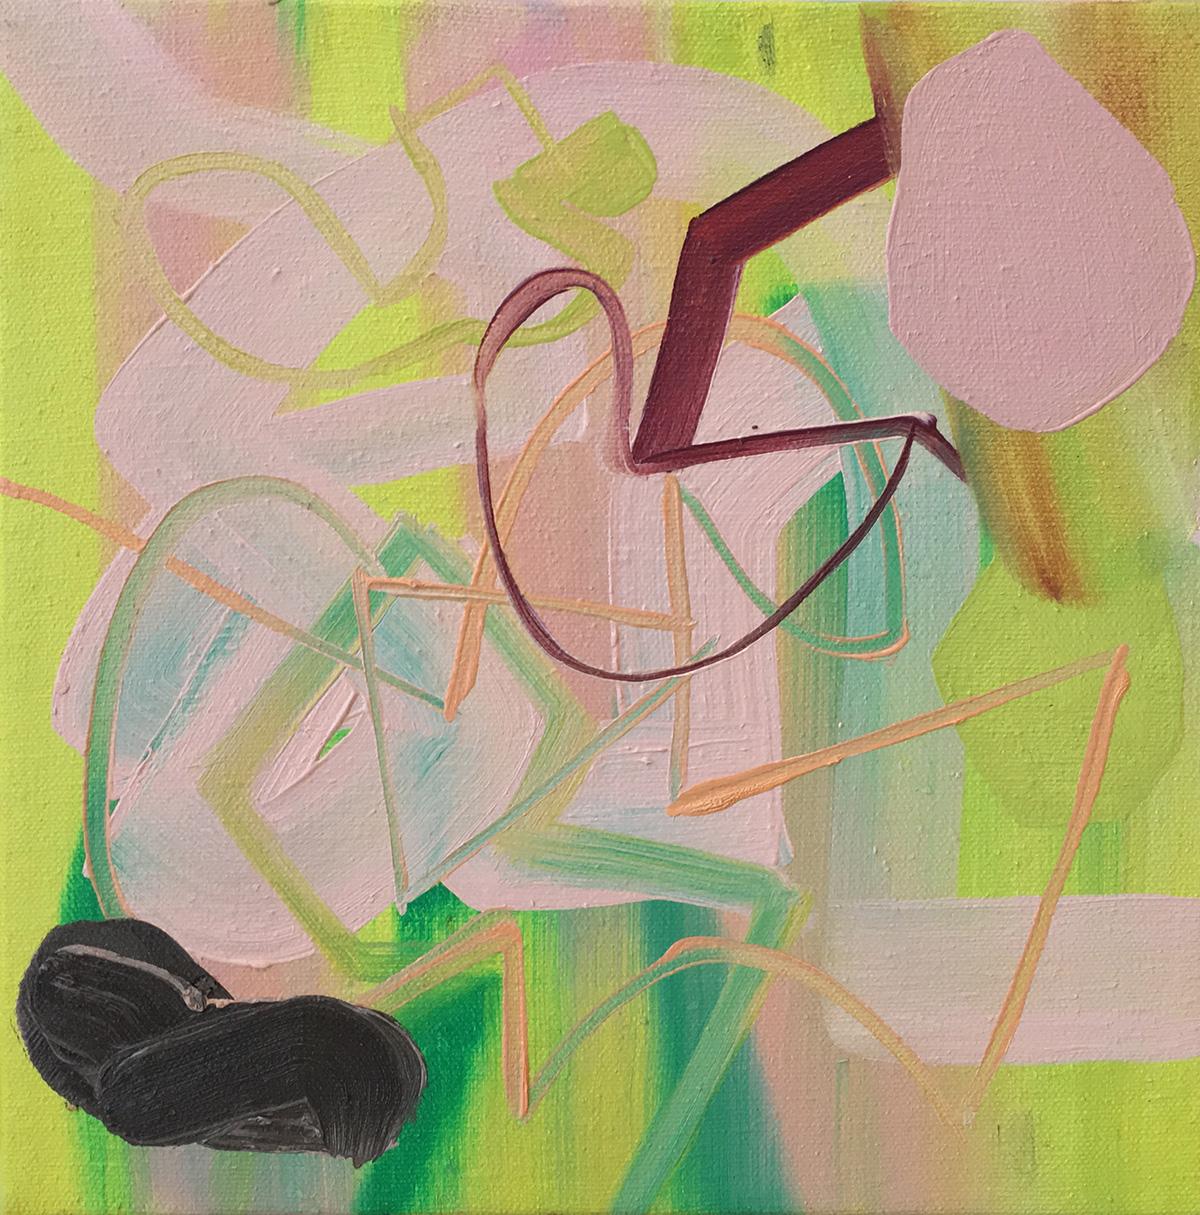 Jennifer LefortUntitled - 2014oil on canvas10 x 10 inches